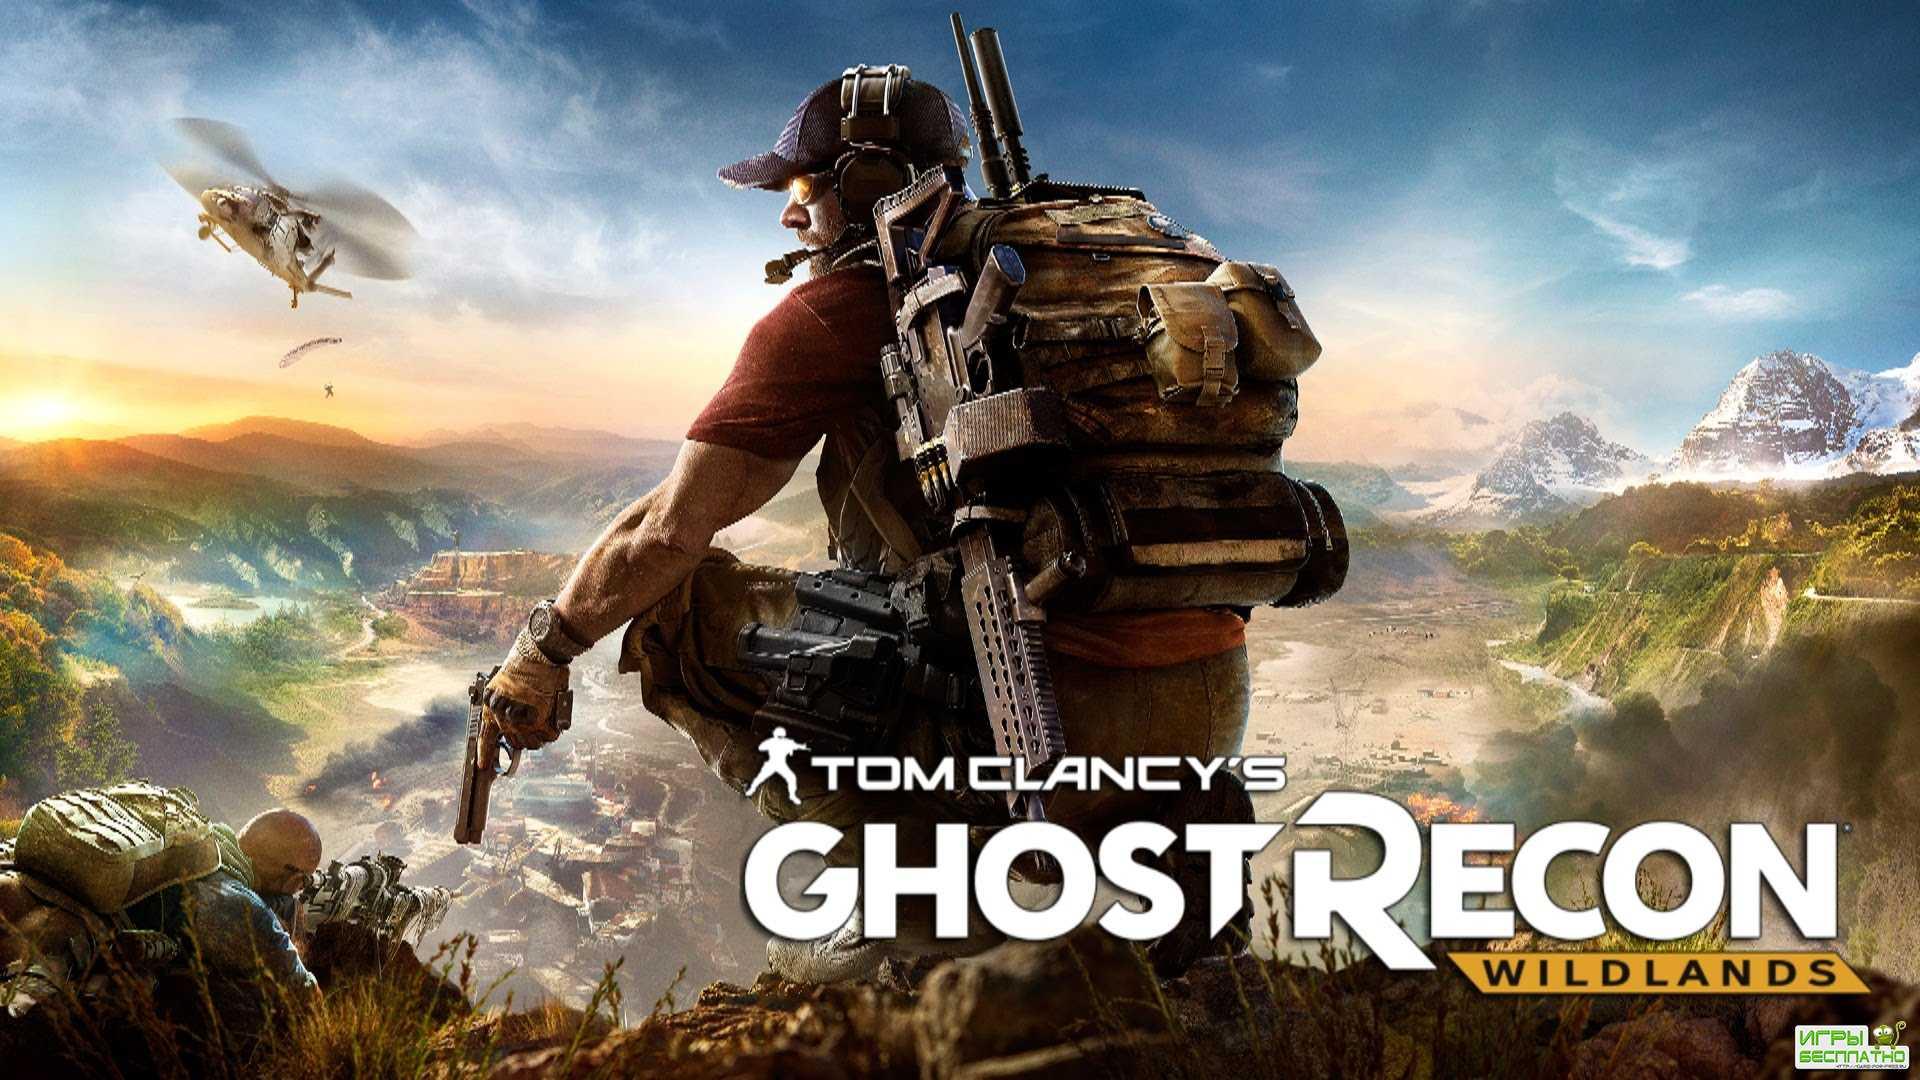 Tom Clancy's Ghost Recon: Wildlands  получила первые оценки